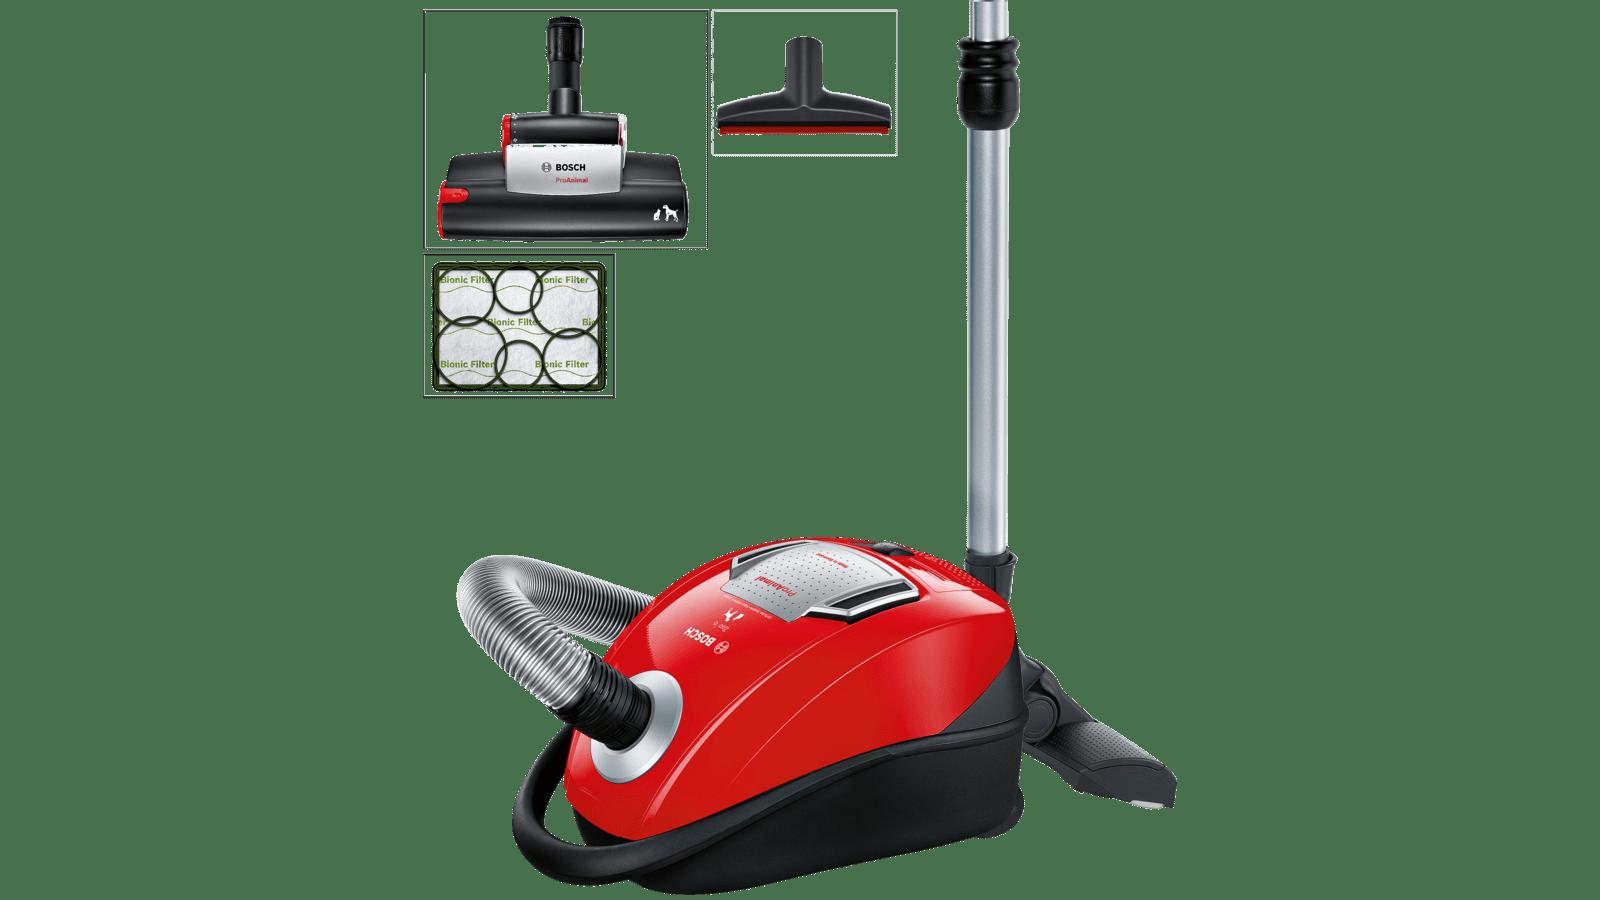 BOSCH BGL45ZOO1 Bagged vacuum cleaner